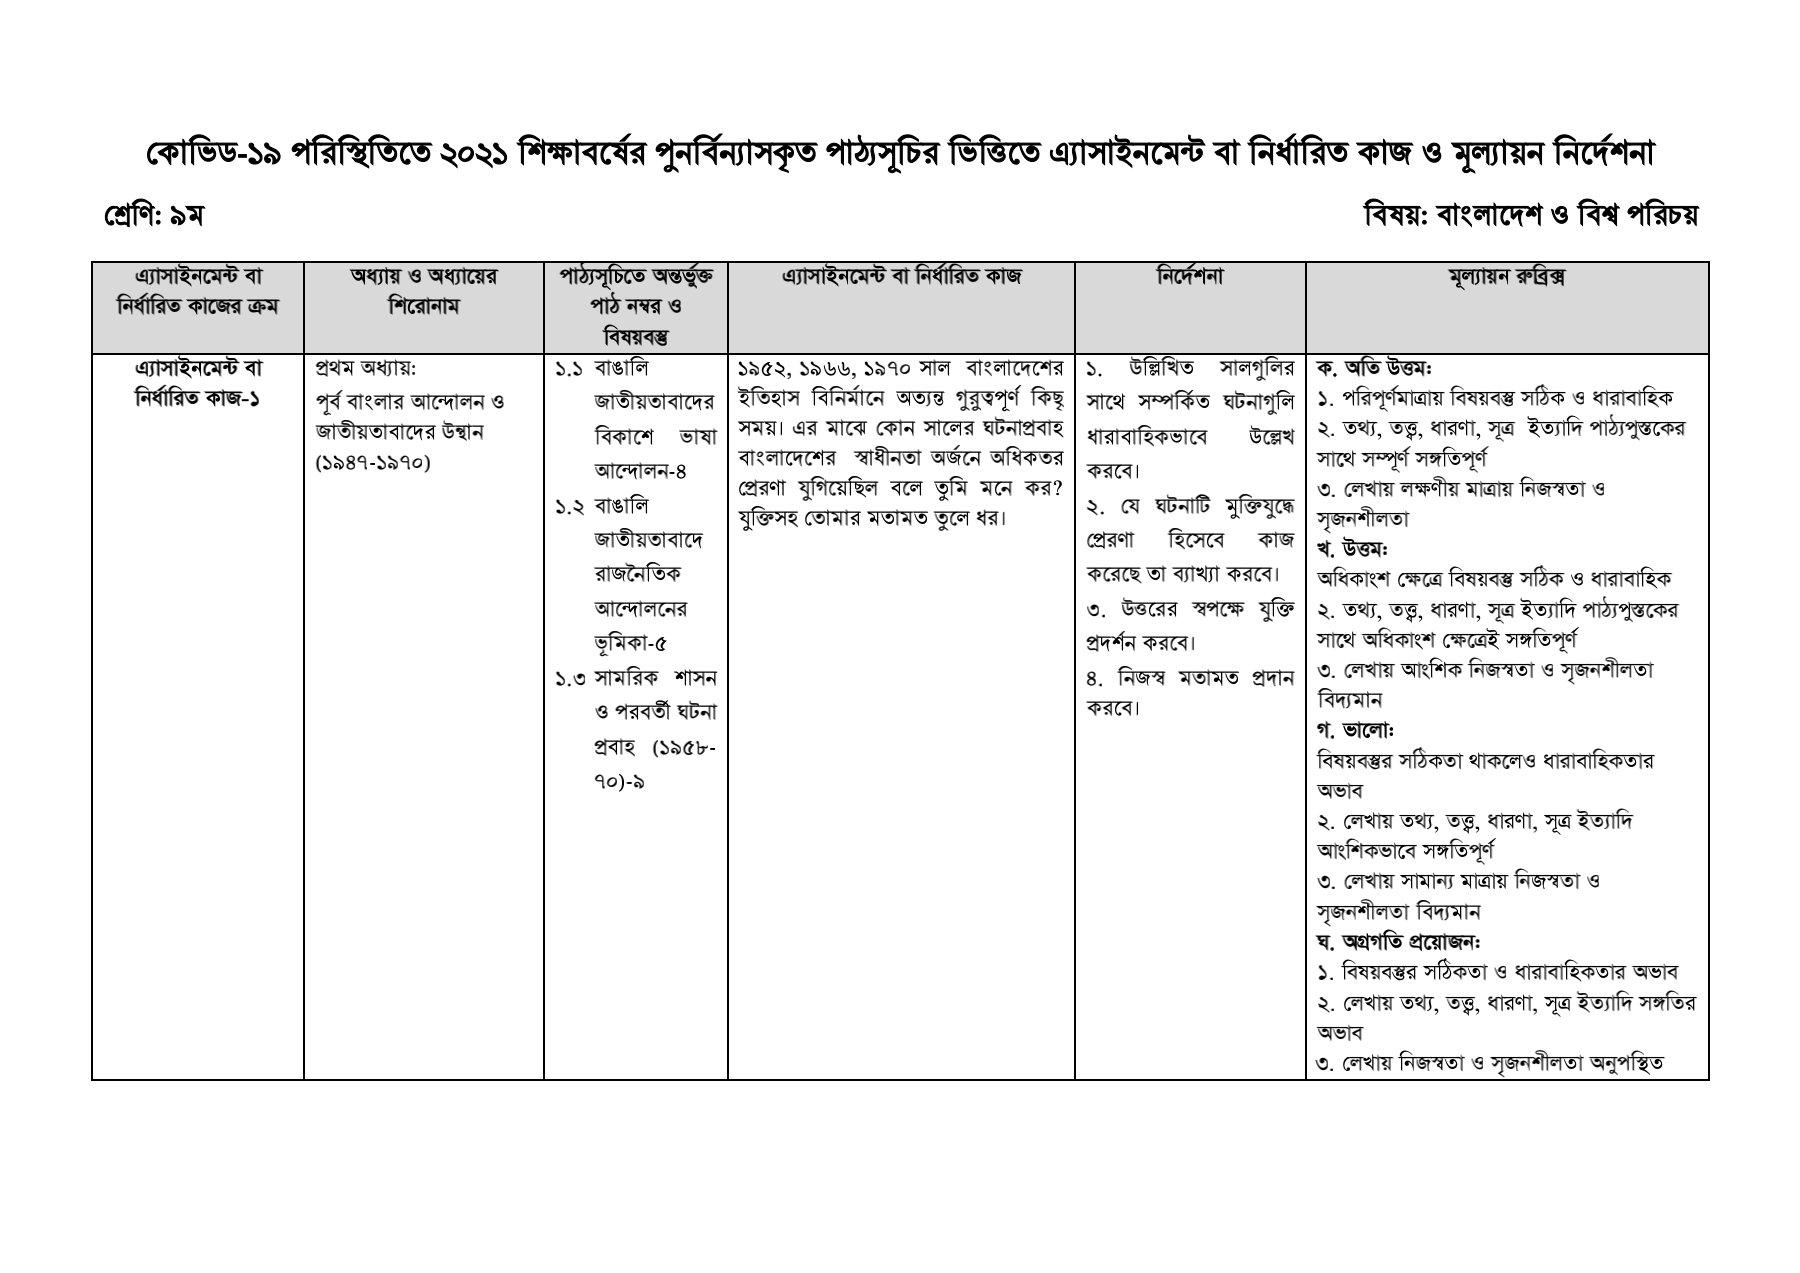 Class 9 1st Assignment Solution 2021   | ৯ম/নবম শ্রেণীর এসাইনমেন্ট উত্তর/সমাধান ২০২১